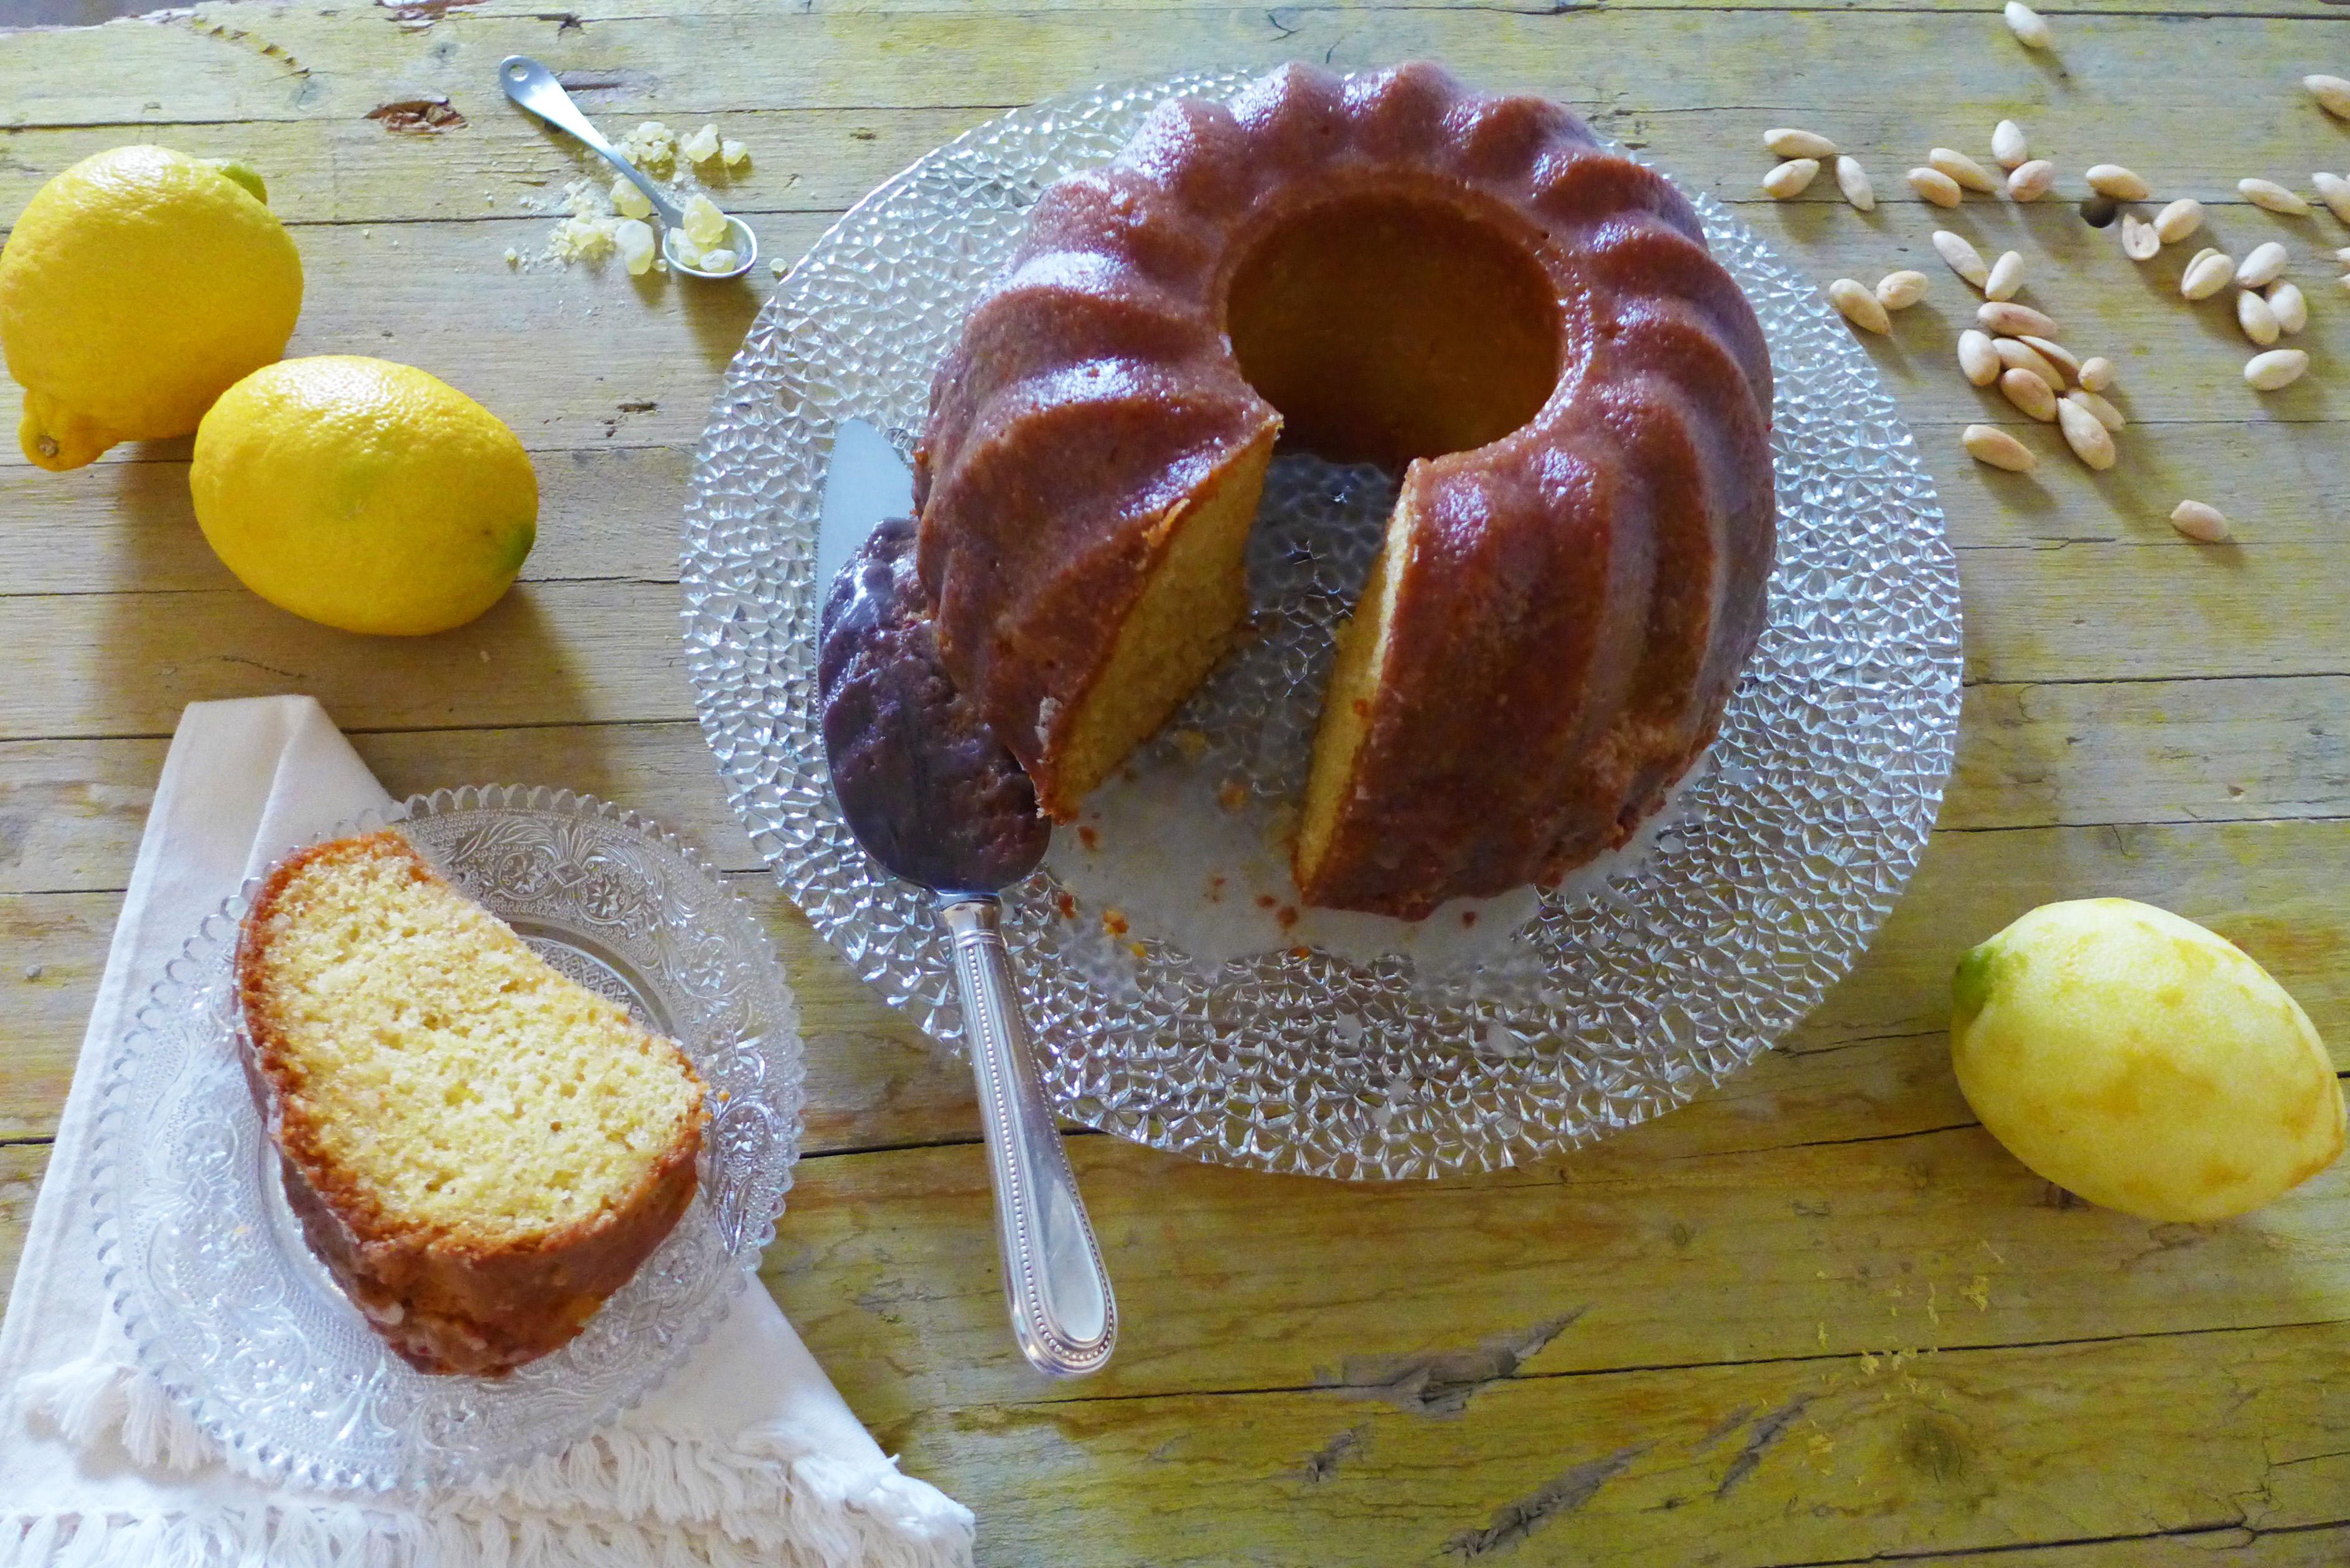 Recipes for mastic cakes